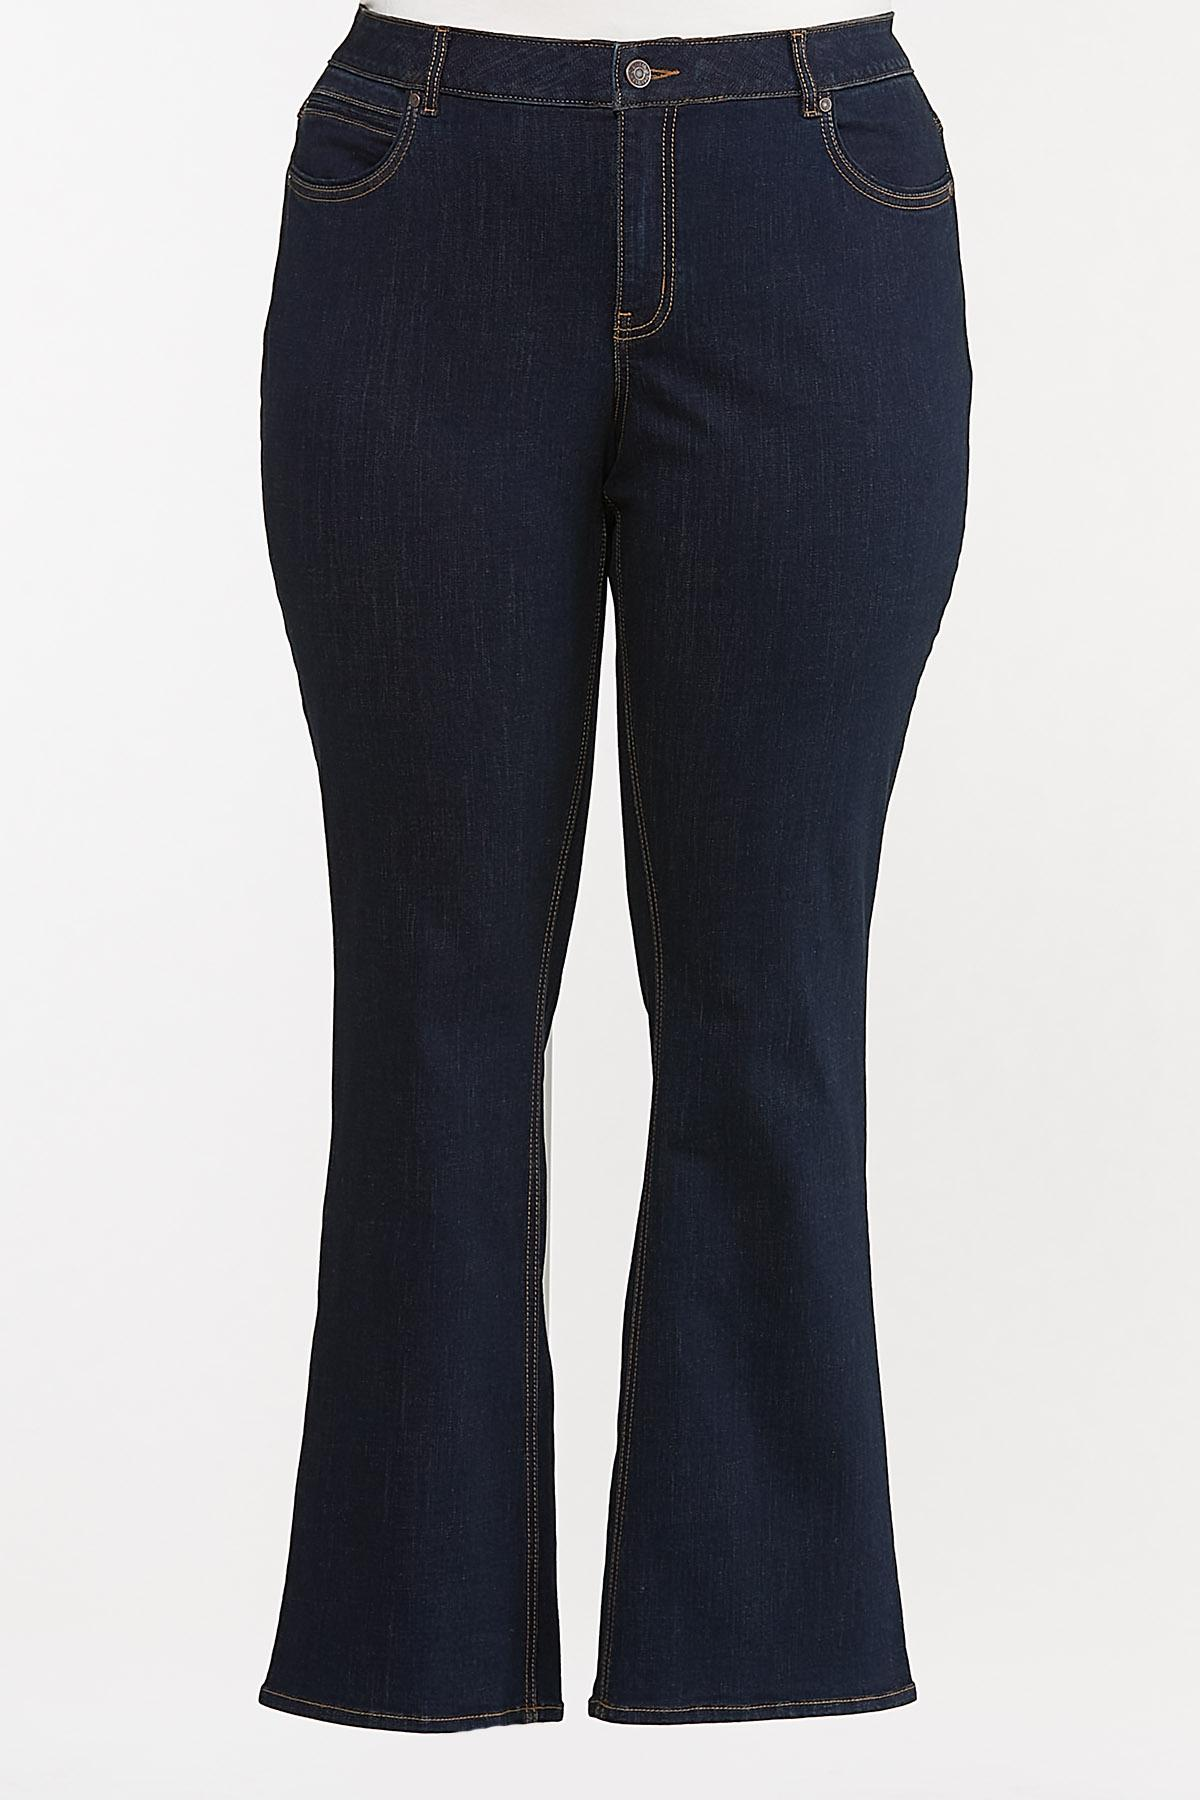 Plus Petite Dark Bootcut Jeans